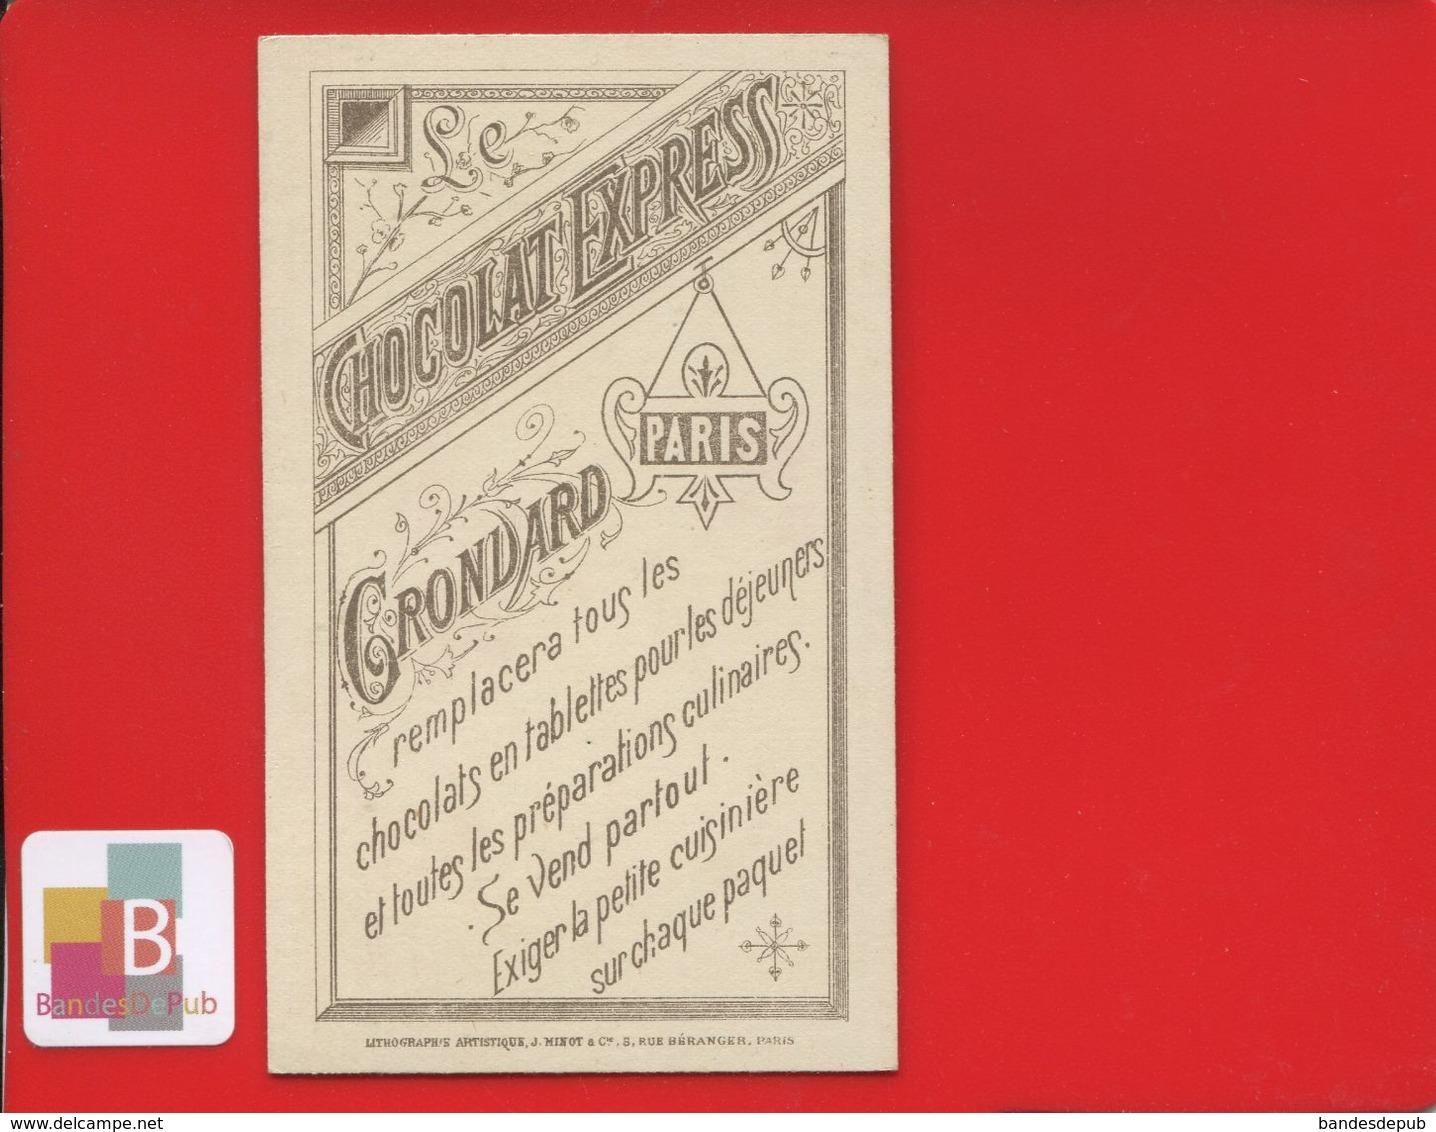 Chocolat Express Grondard Paris Jolie Chromo Magie Ombres Chinoise Croquemitaine Cartes Jouer Jeu Lampe Lith Minot - Chocolat